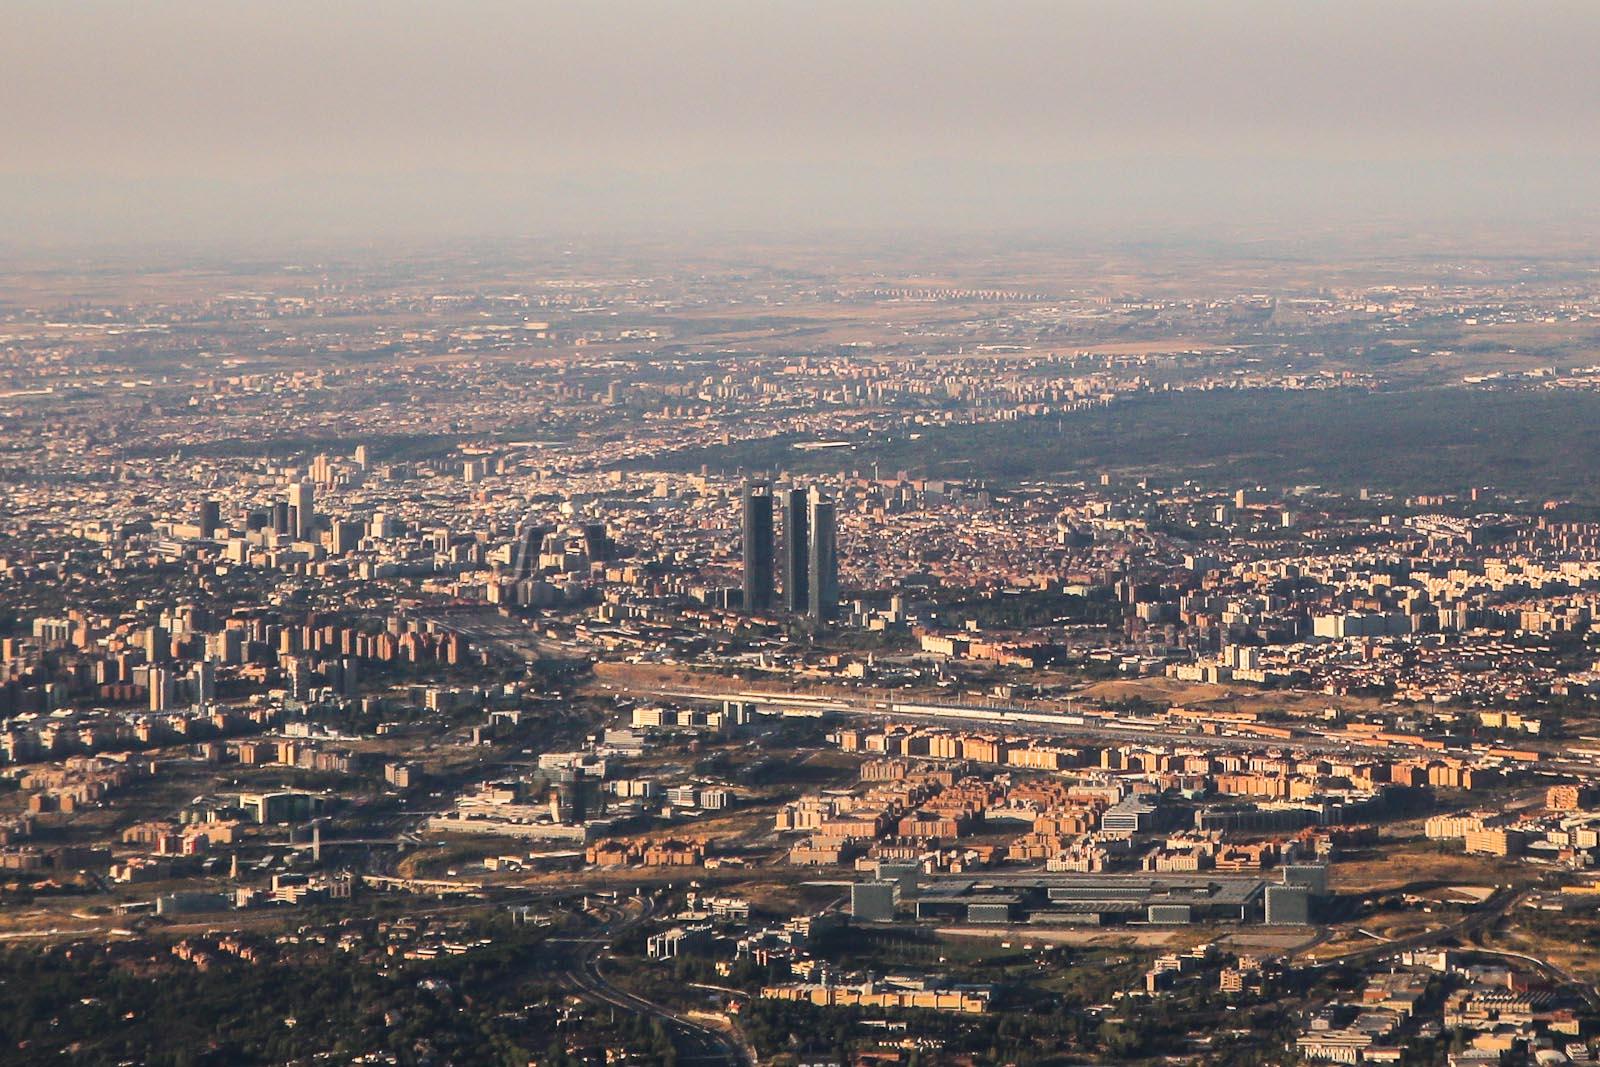 Вид на бизнес-центр Мадрида при взлете из аэропорта Барахас